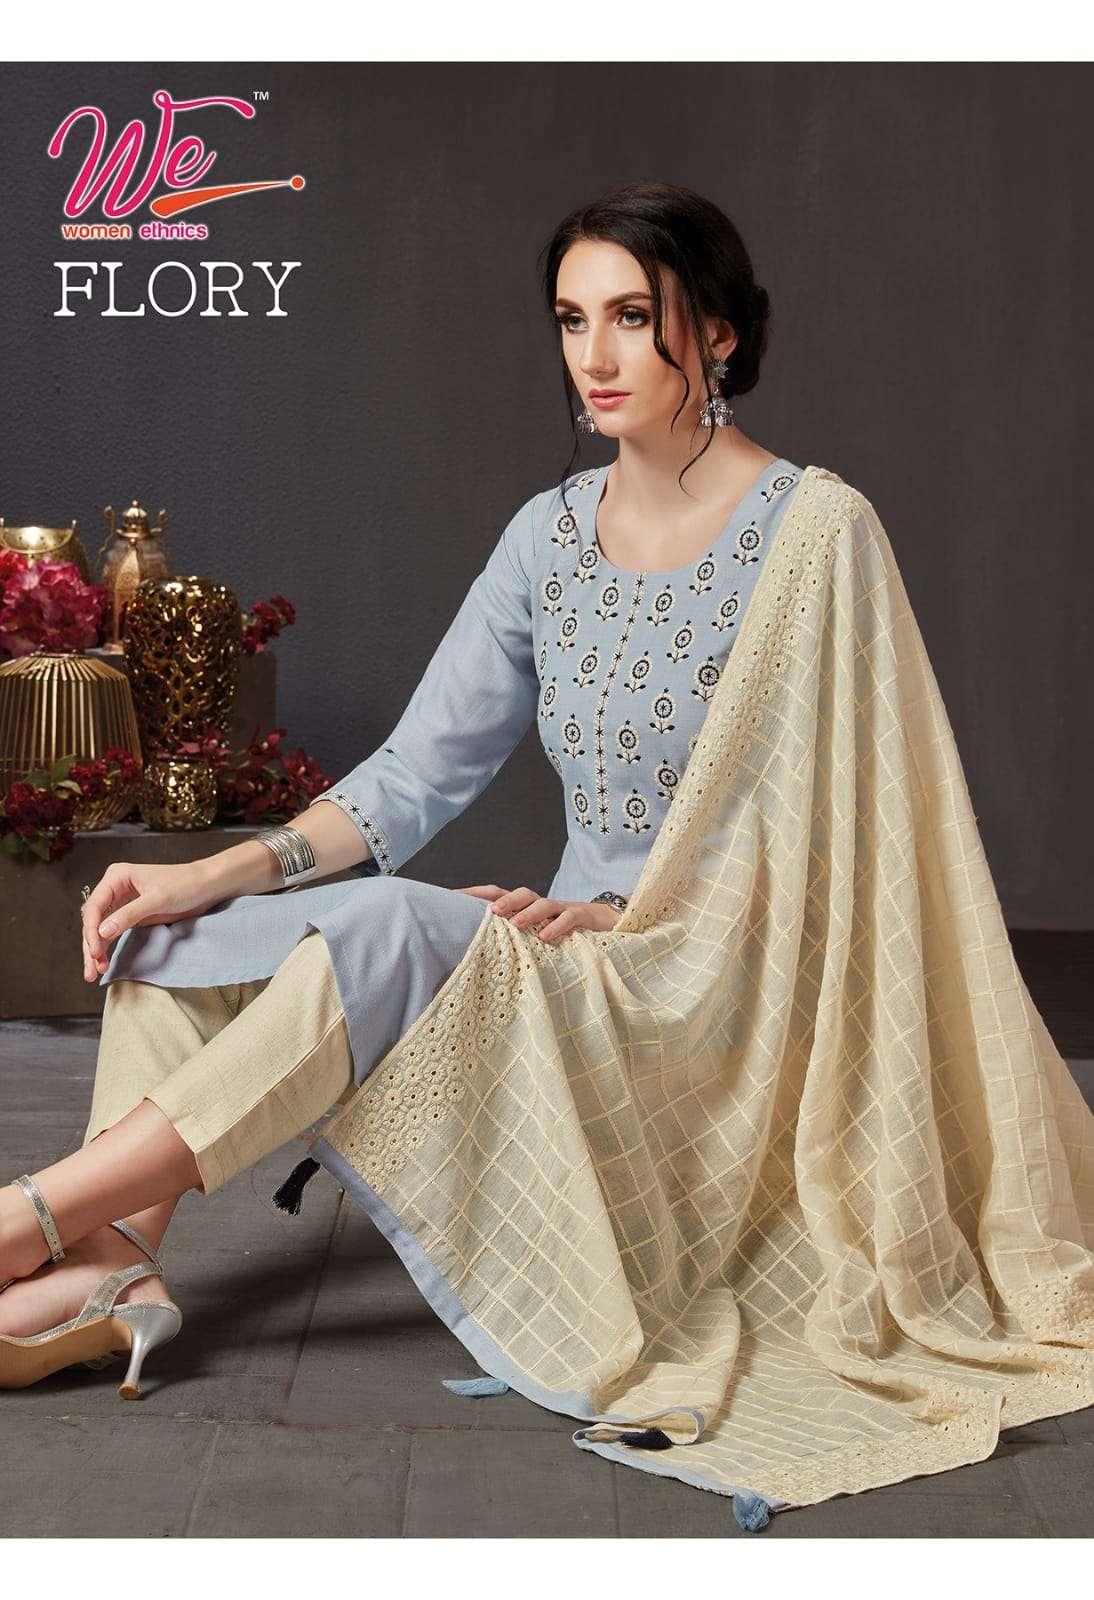 we flory series 9701-9703 bombay soft cotton kurti with dupatta